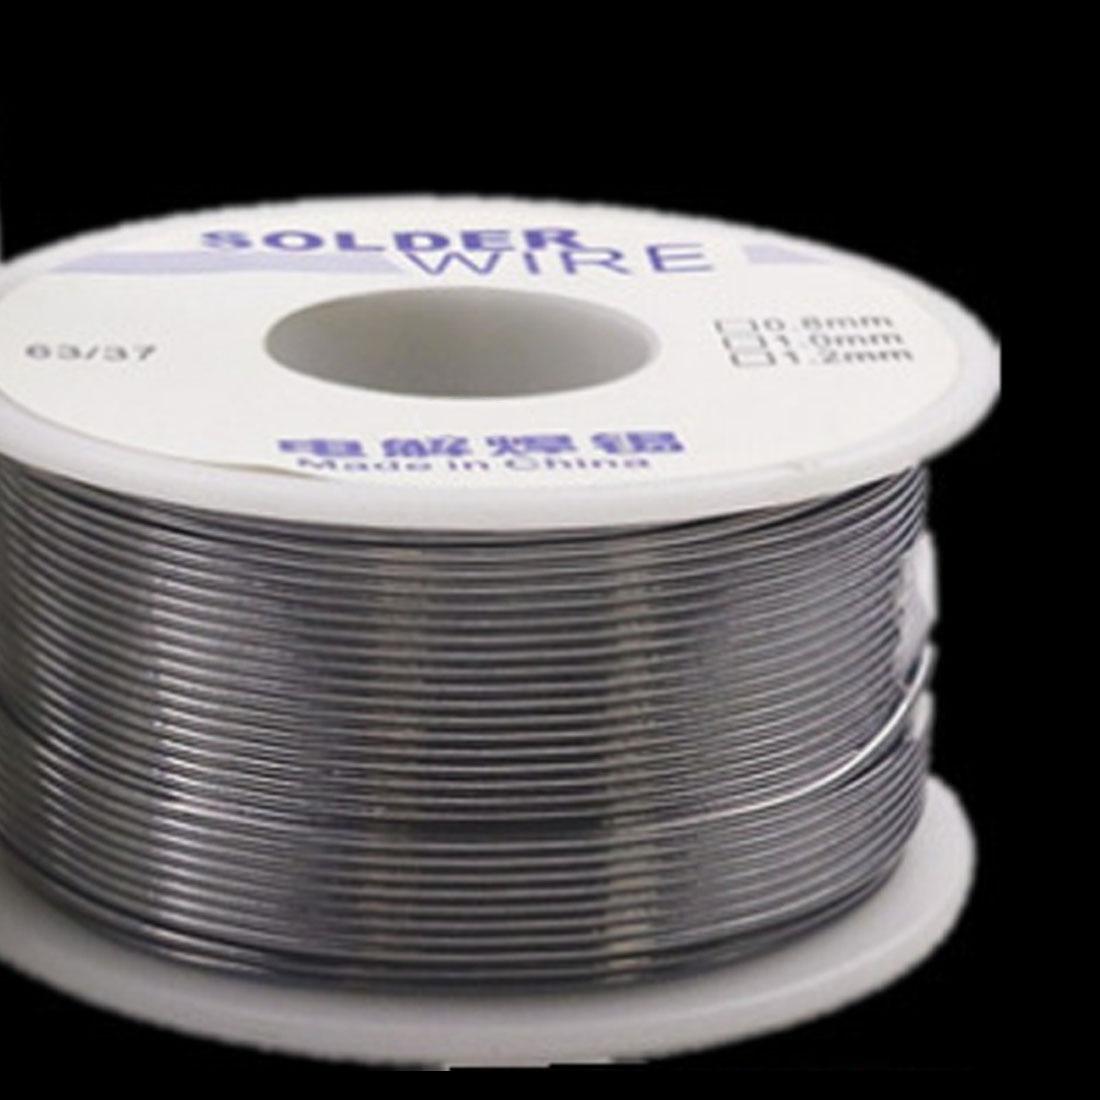 Schweißdrähte Temperamentvoll 63/37 50g 1,0mm/0,8mm 2,0-2.3% Flussmittel Kolophonium Kern Weldring Zinn Blei Industrielle Lötdraht Schweißen & Löten Supplies